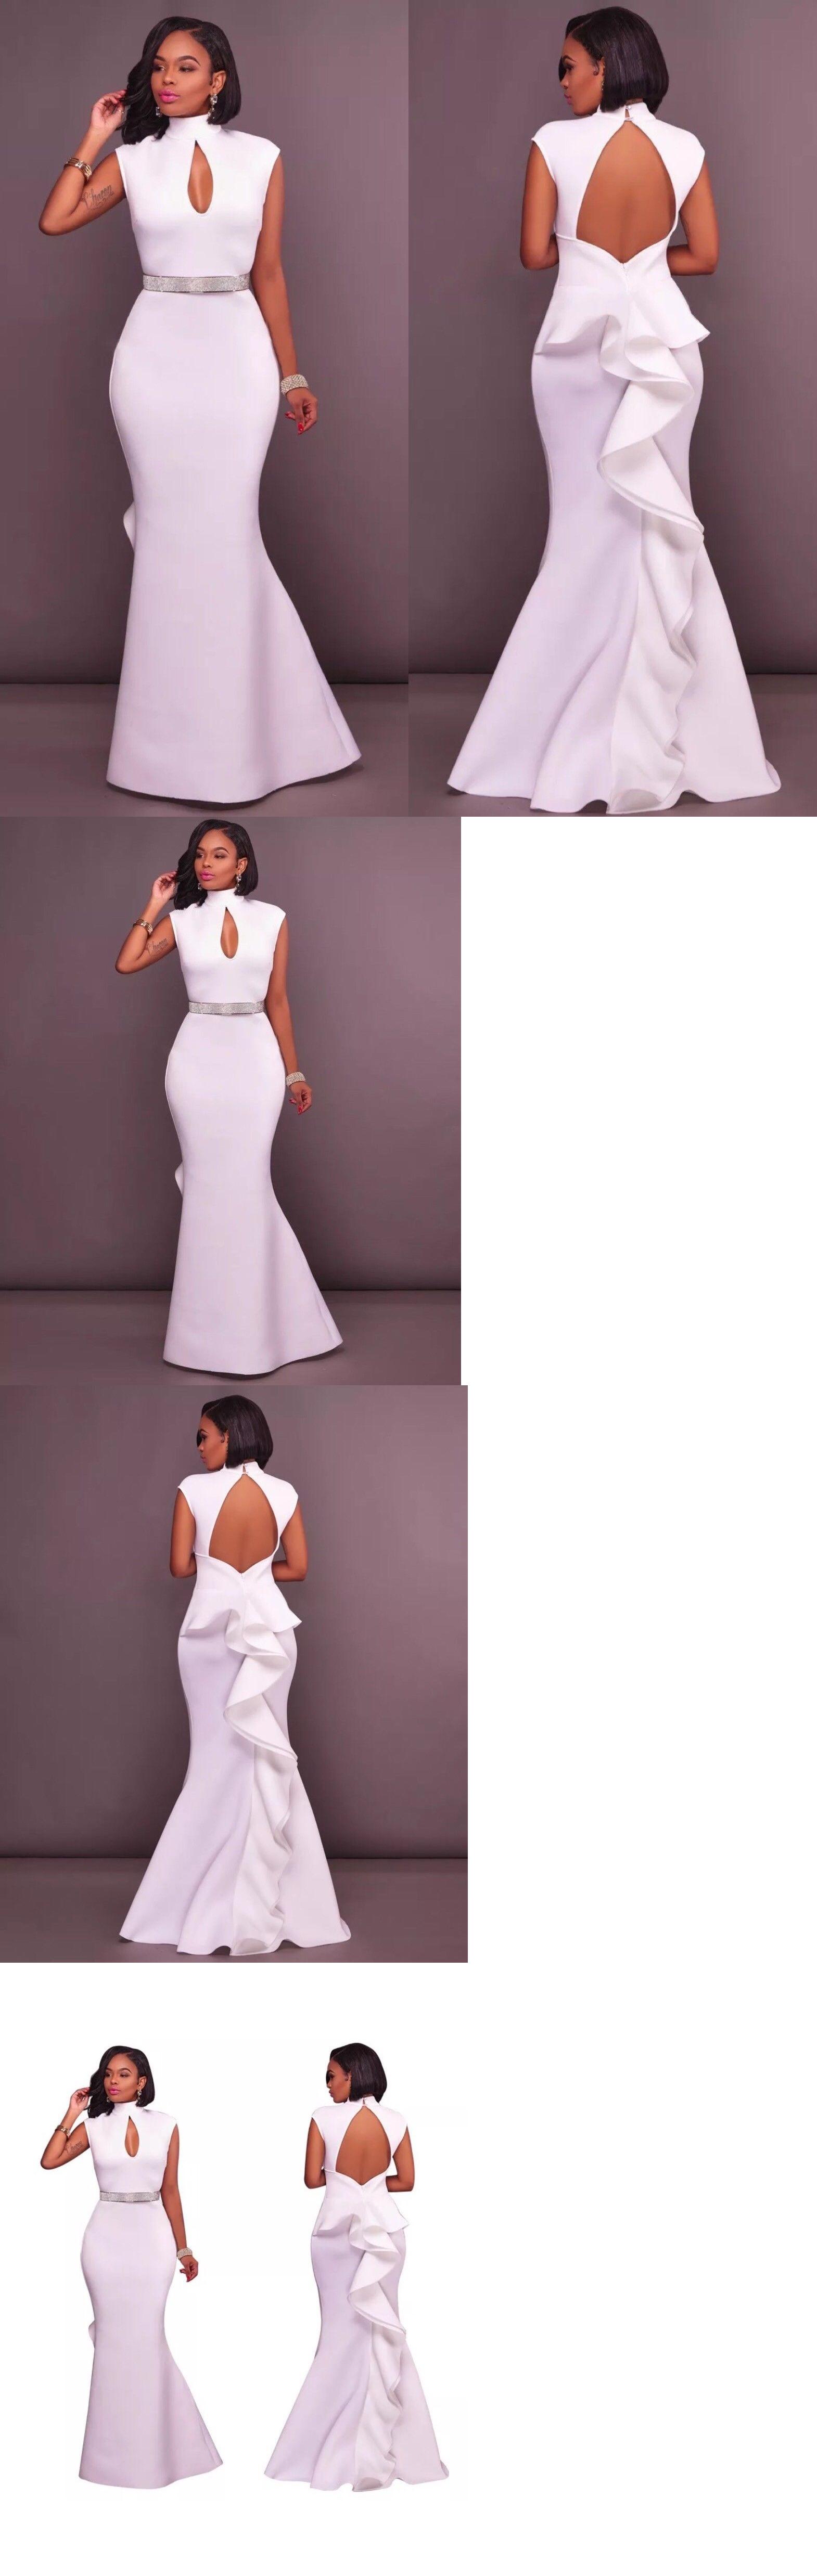 Dresses us women s high fashion cloak cocktail white long